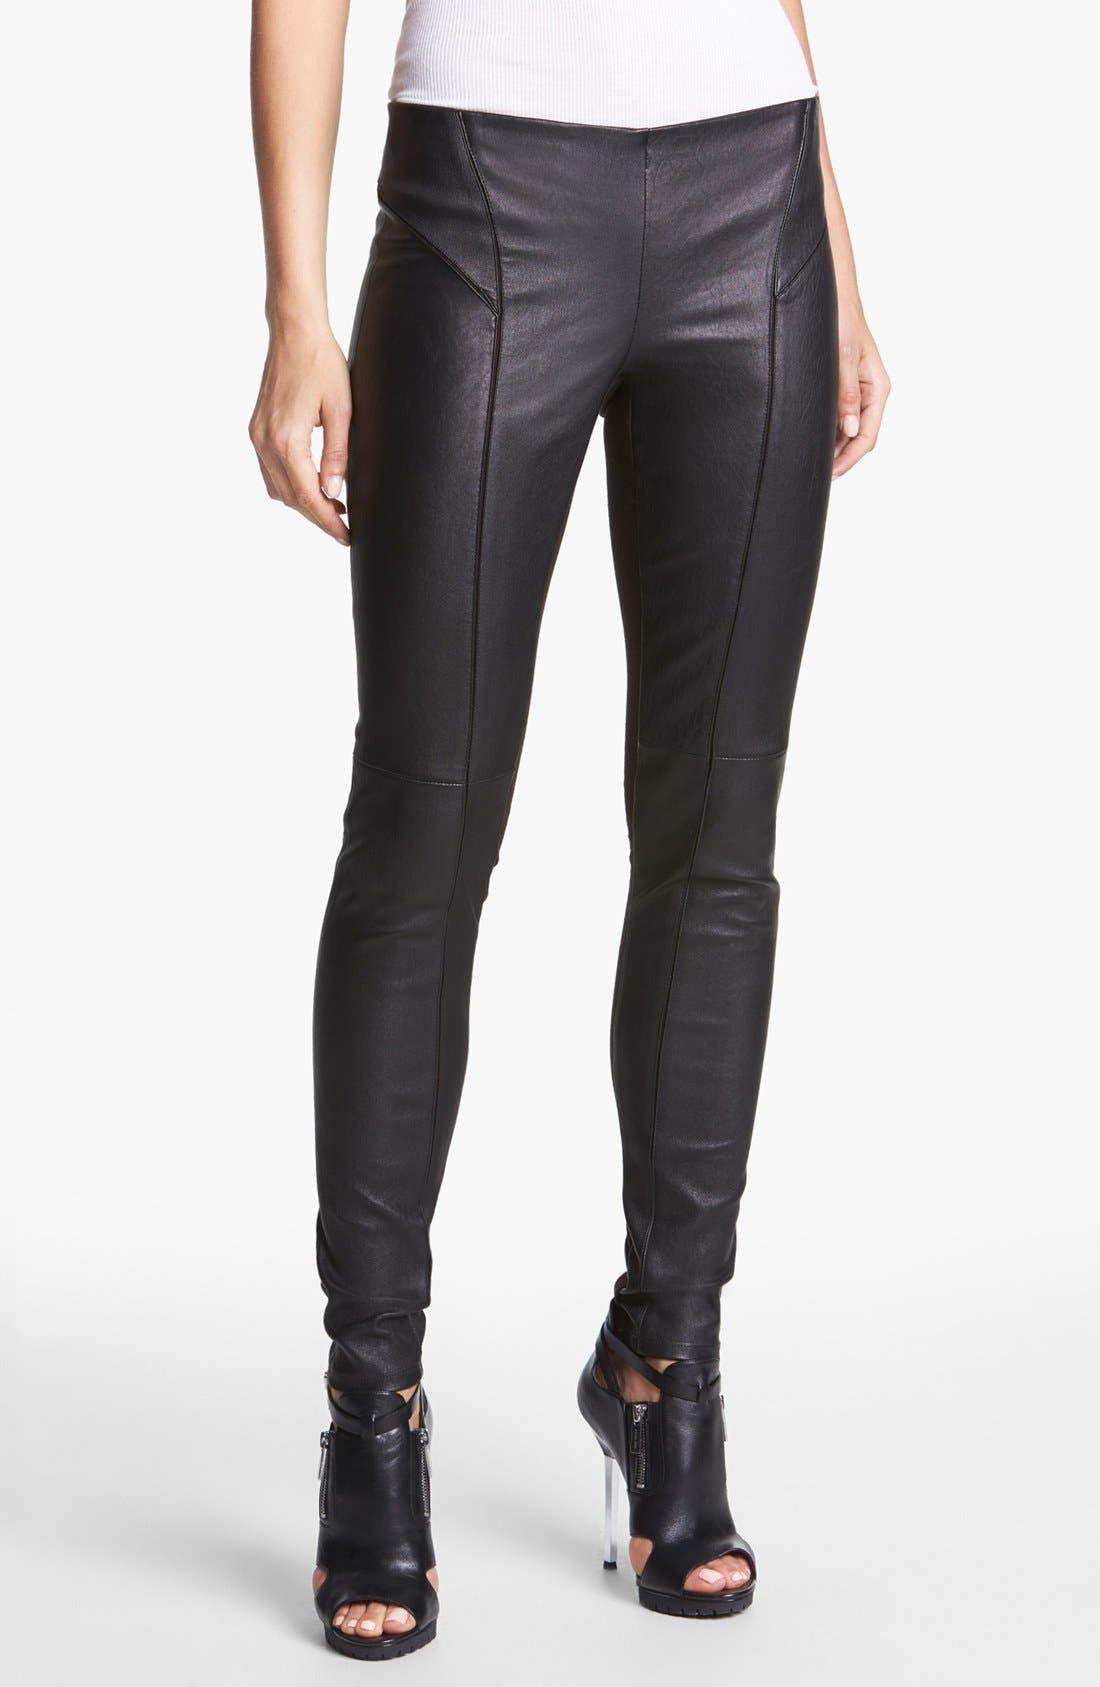 Main Image - Theory 'Miana' Leather & Knit Skinny Pants